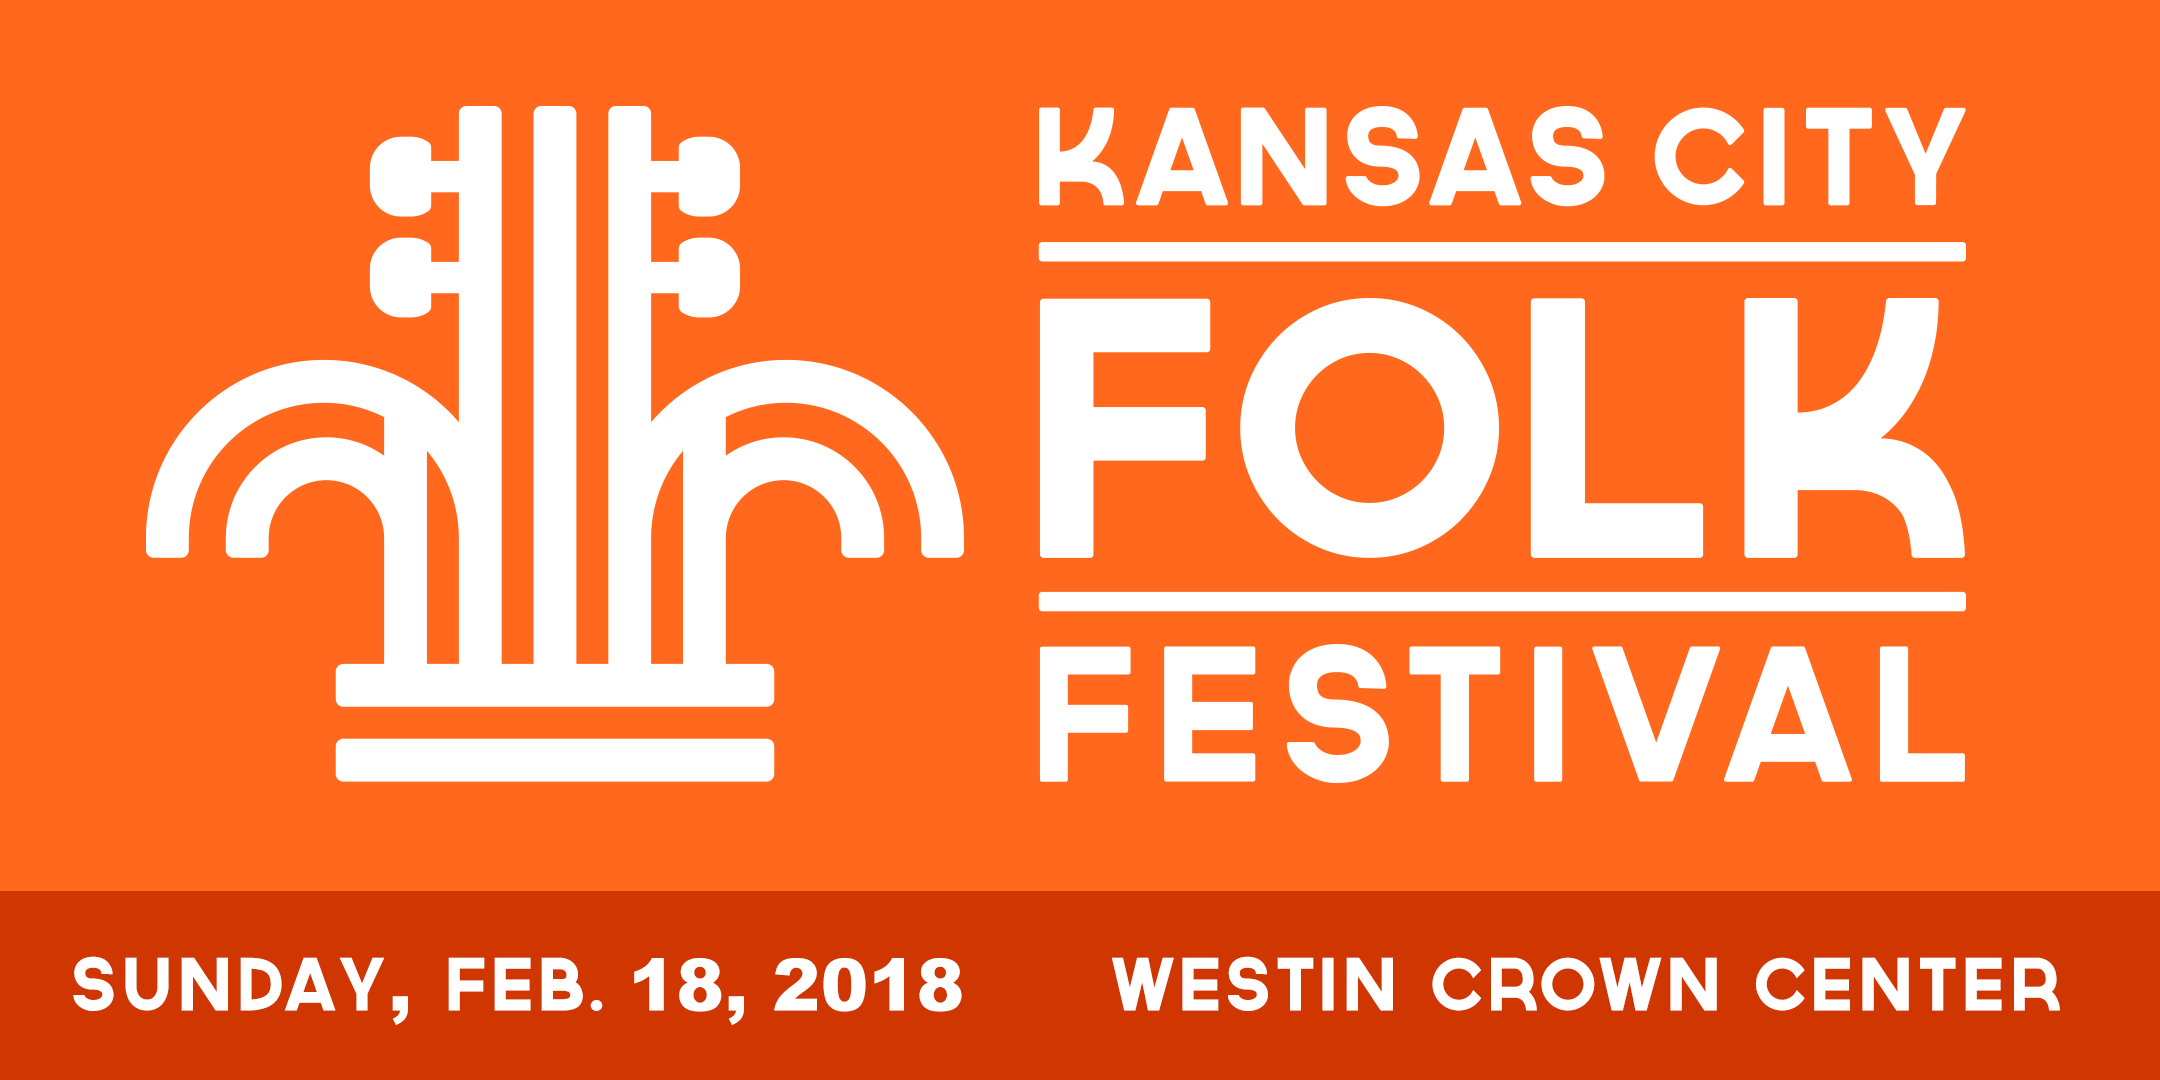 Kansas City Folk Festival